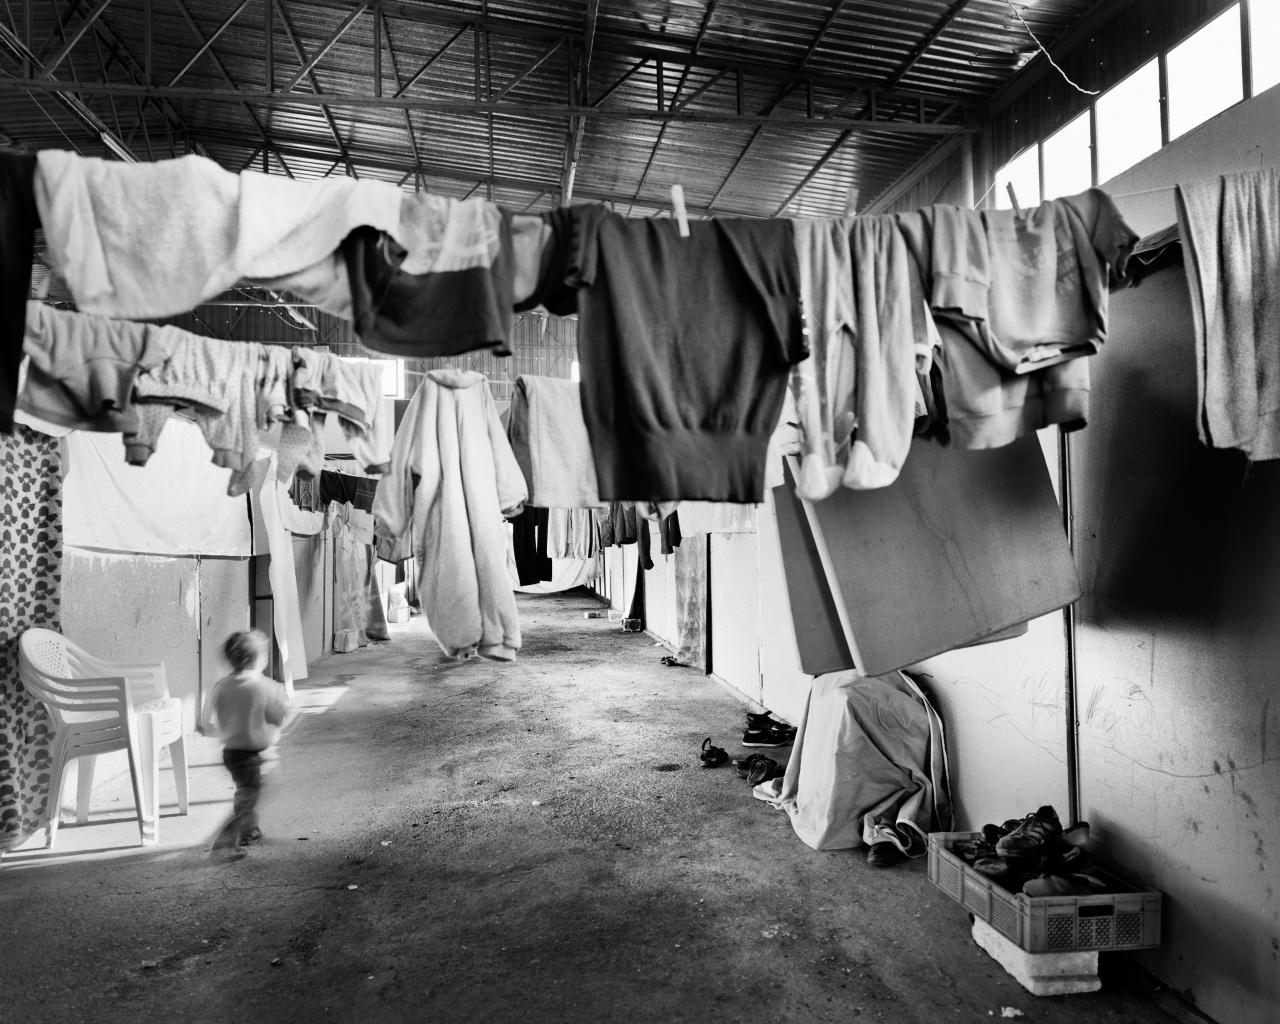 Syrian-Palestinian shelter in Kilis